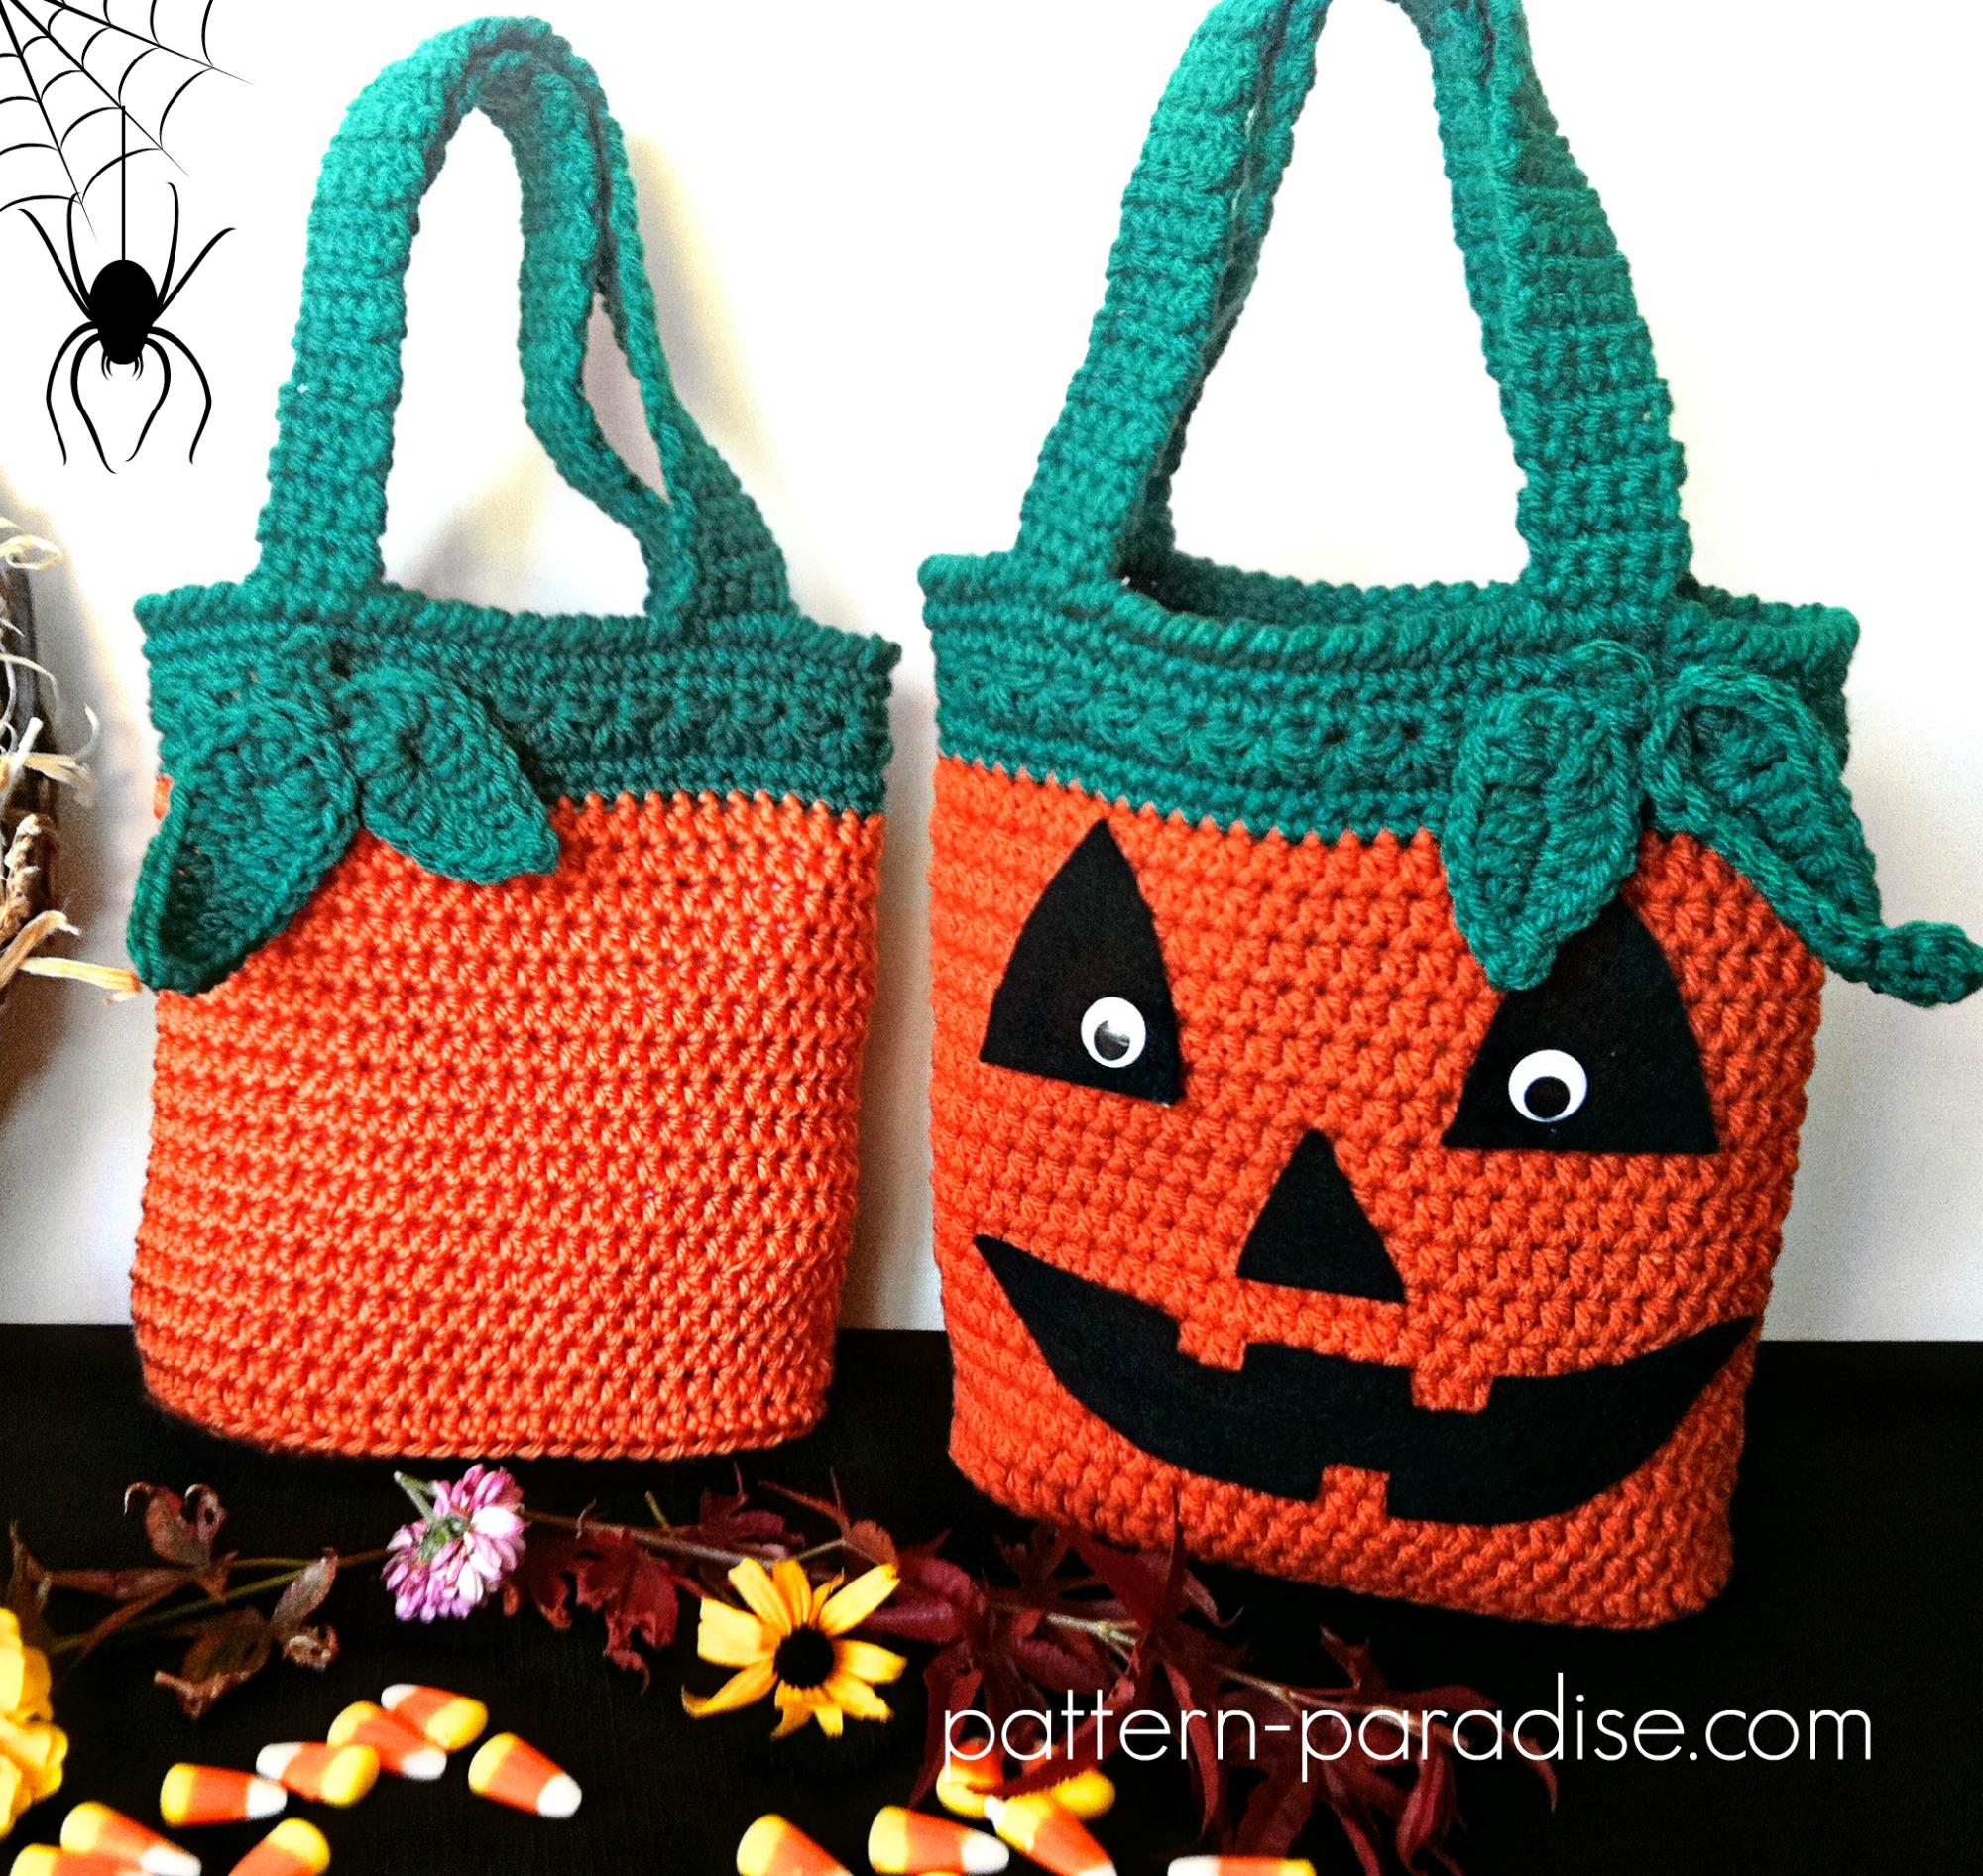 StrawSherries\' Favourites: Free Crocheted Halloween Bag Patterns ...